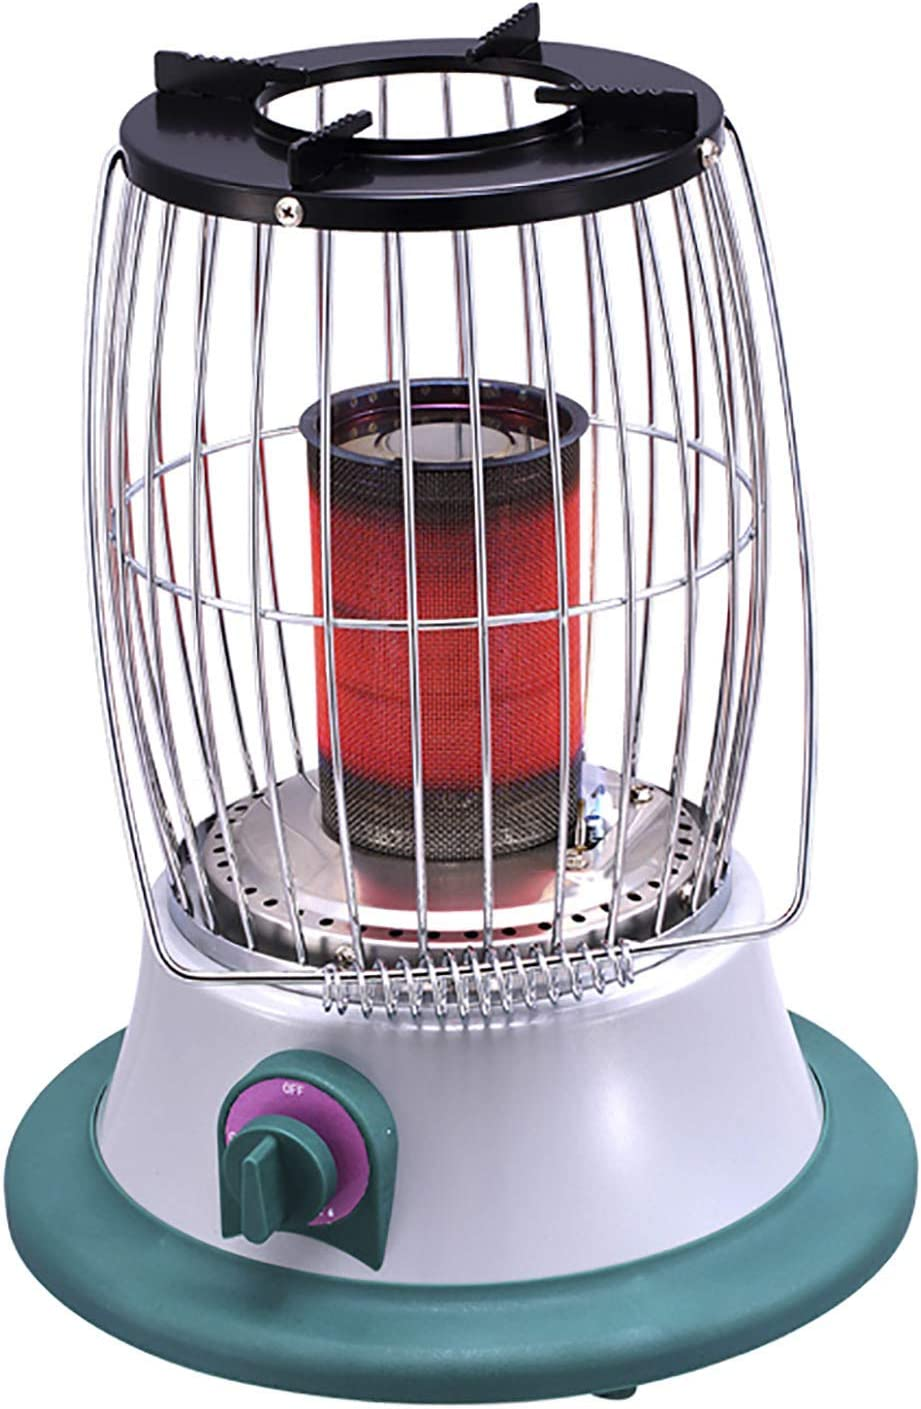 zks Calentador De Gas Mini Calentador De Agua Portátil Multifunción para Asar A La Parrilla Gas Natural Gas Licuado Puede Estar A Bordo